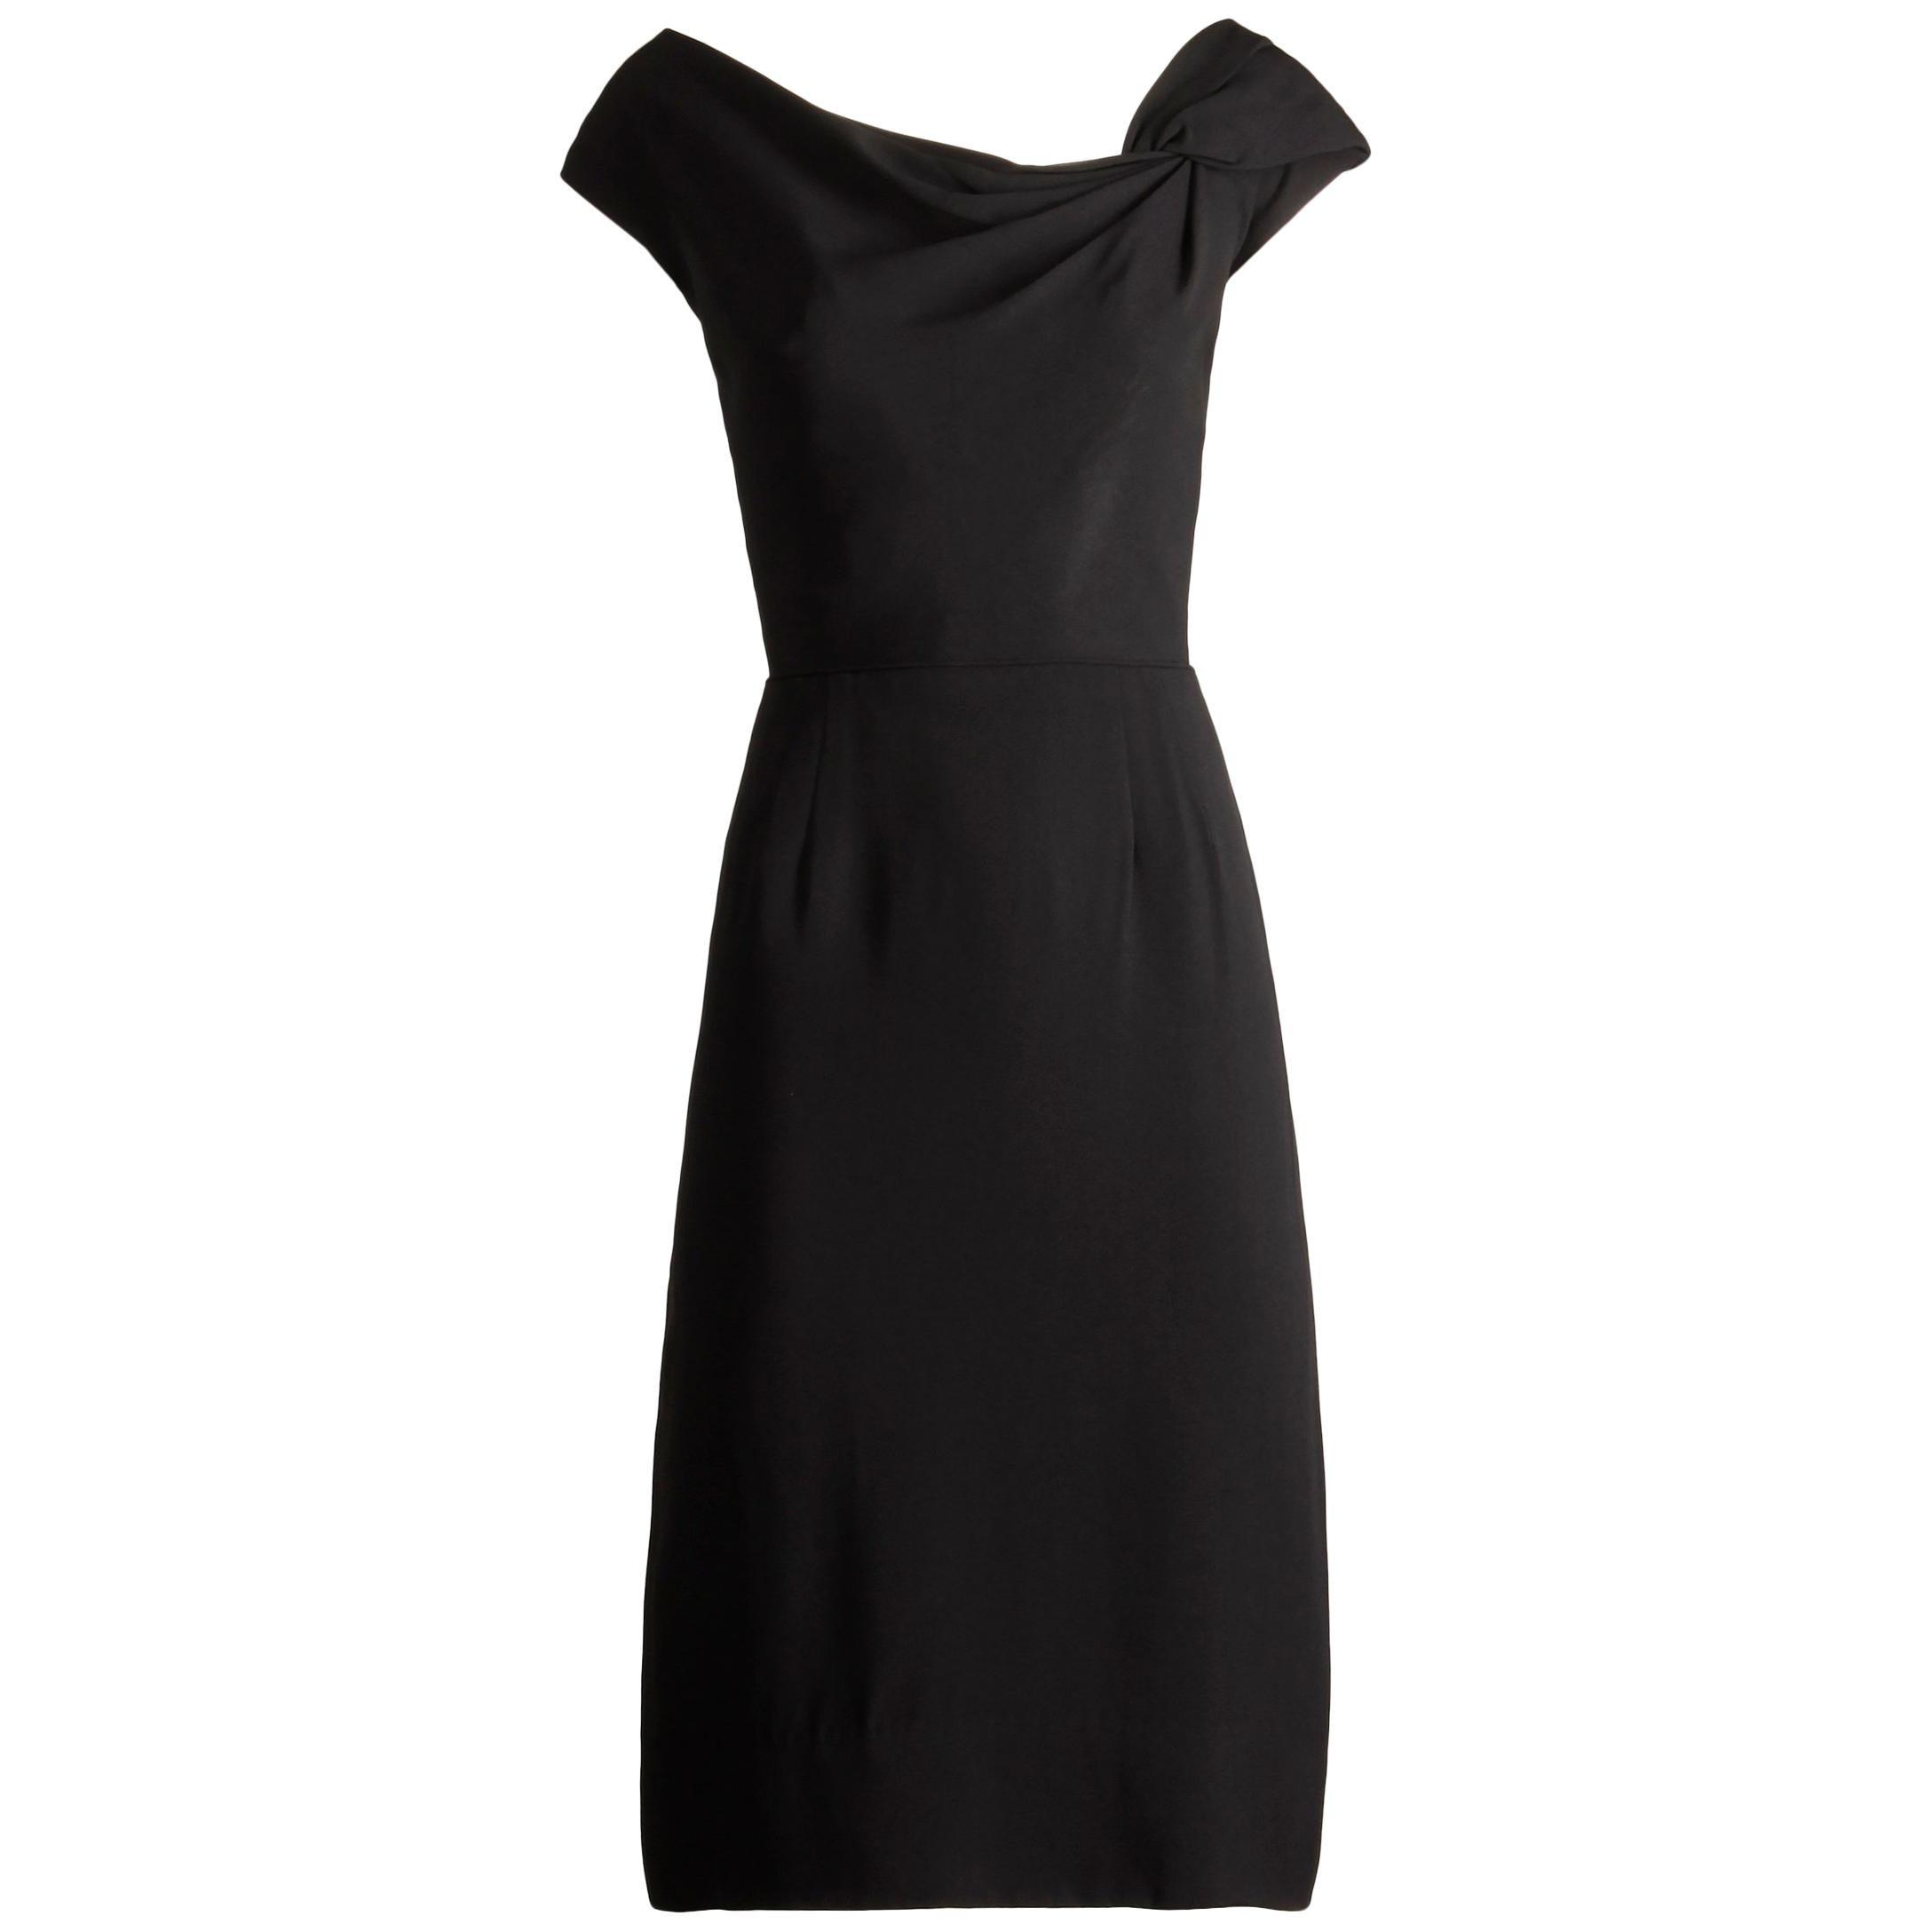 1950s Dorothy O'Hara Vintage Black Asymmetric Cocktail Sheath Dress